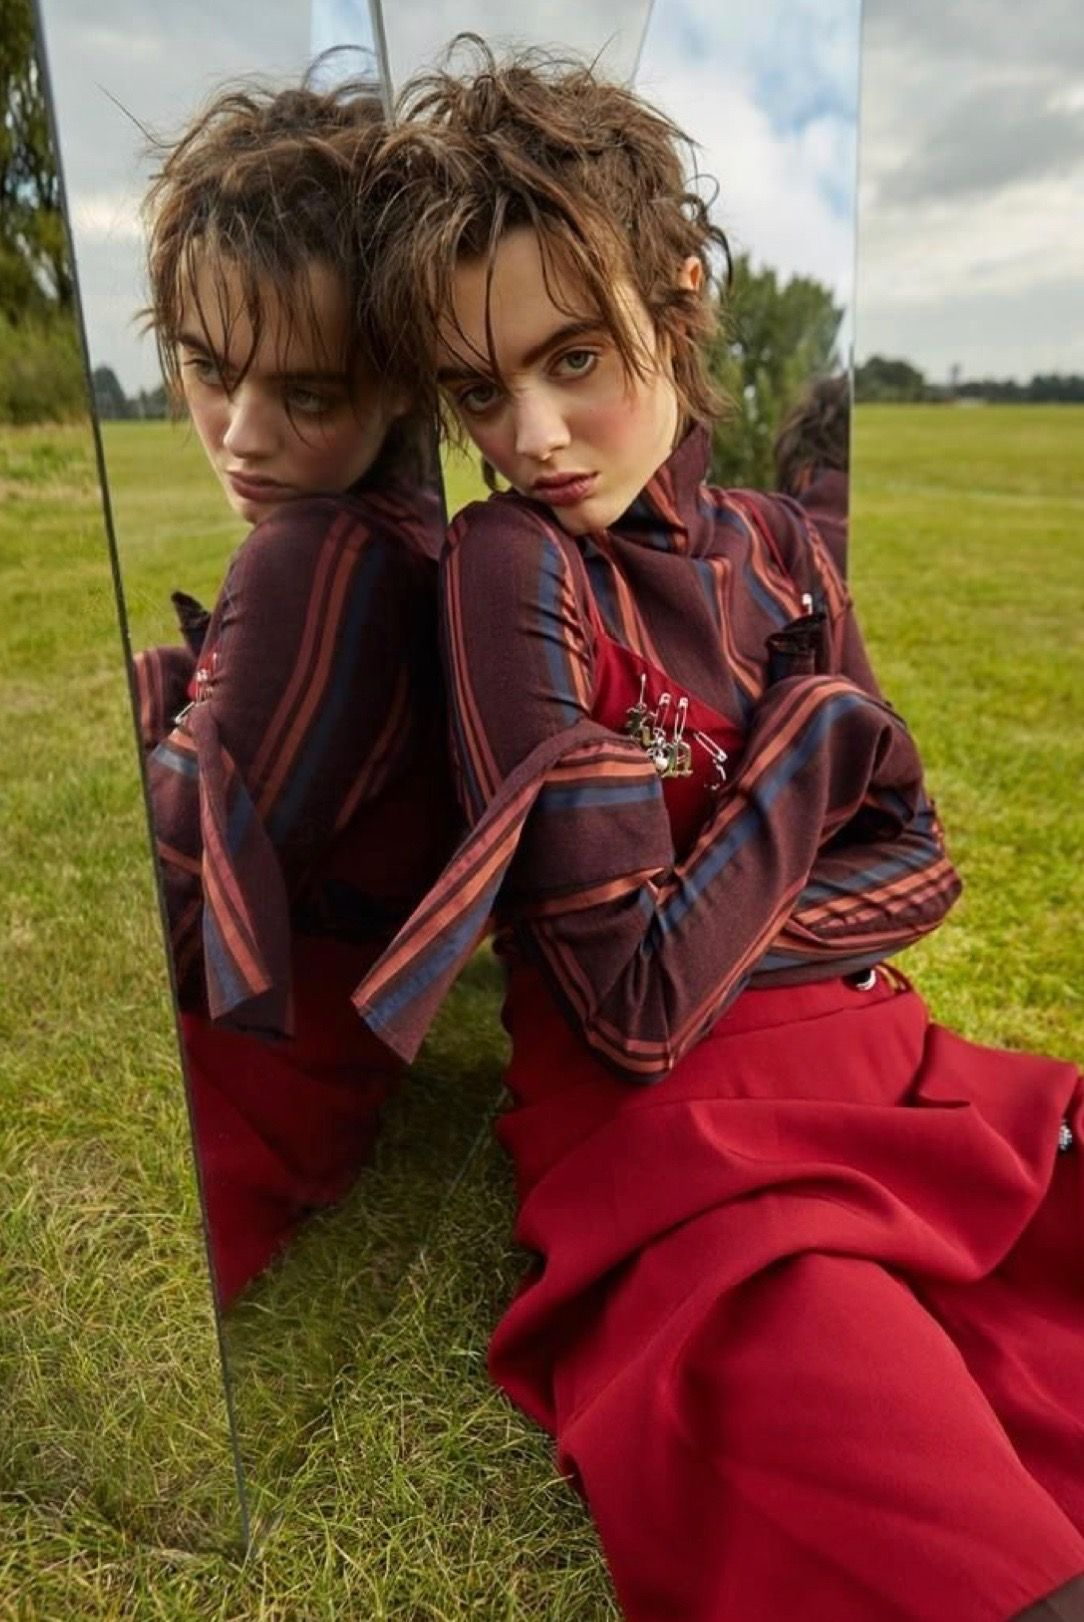 Pin By Lauren Pollitt On Photography Fashion Mirror Fashion